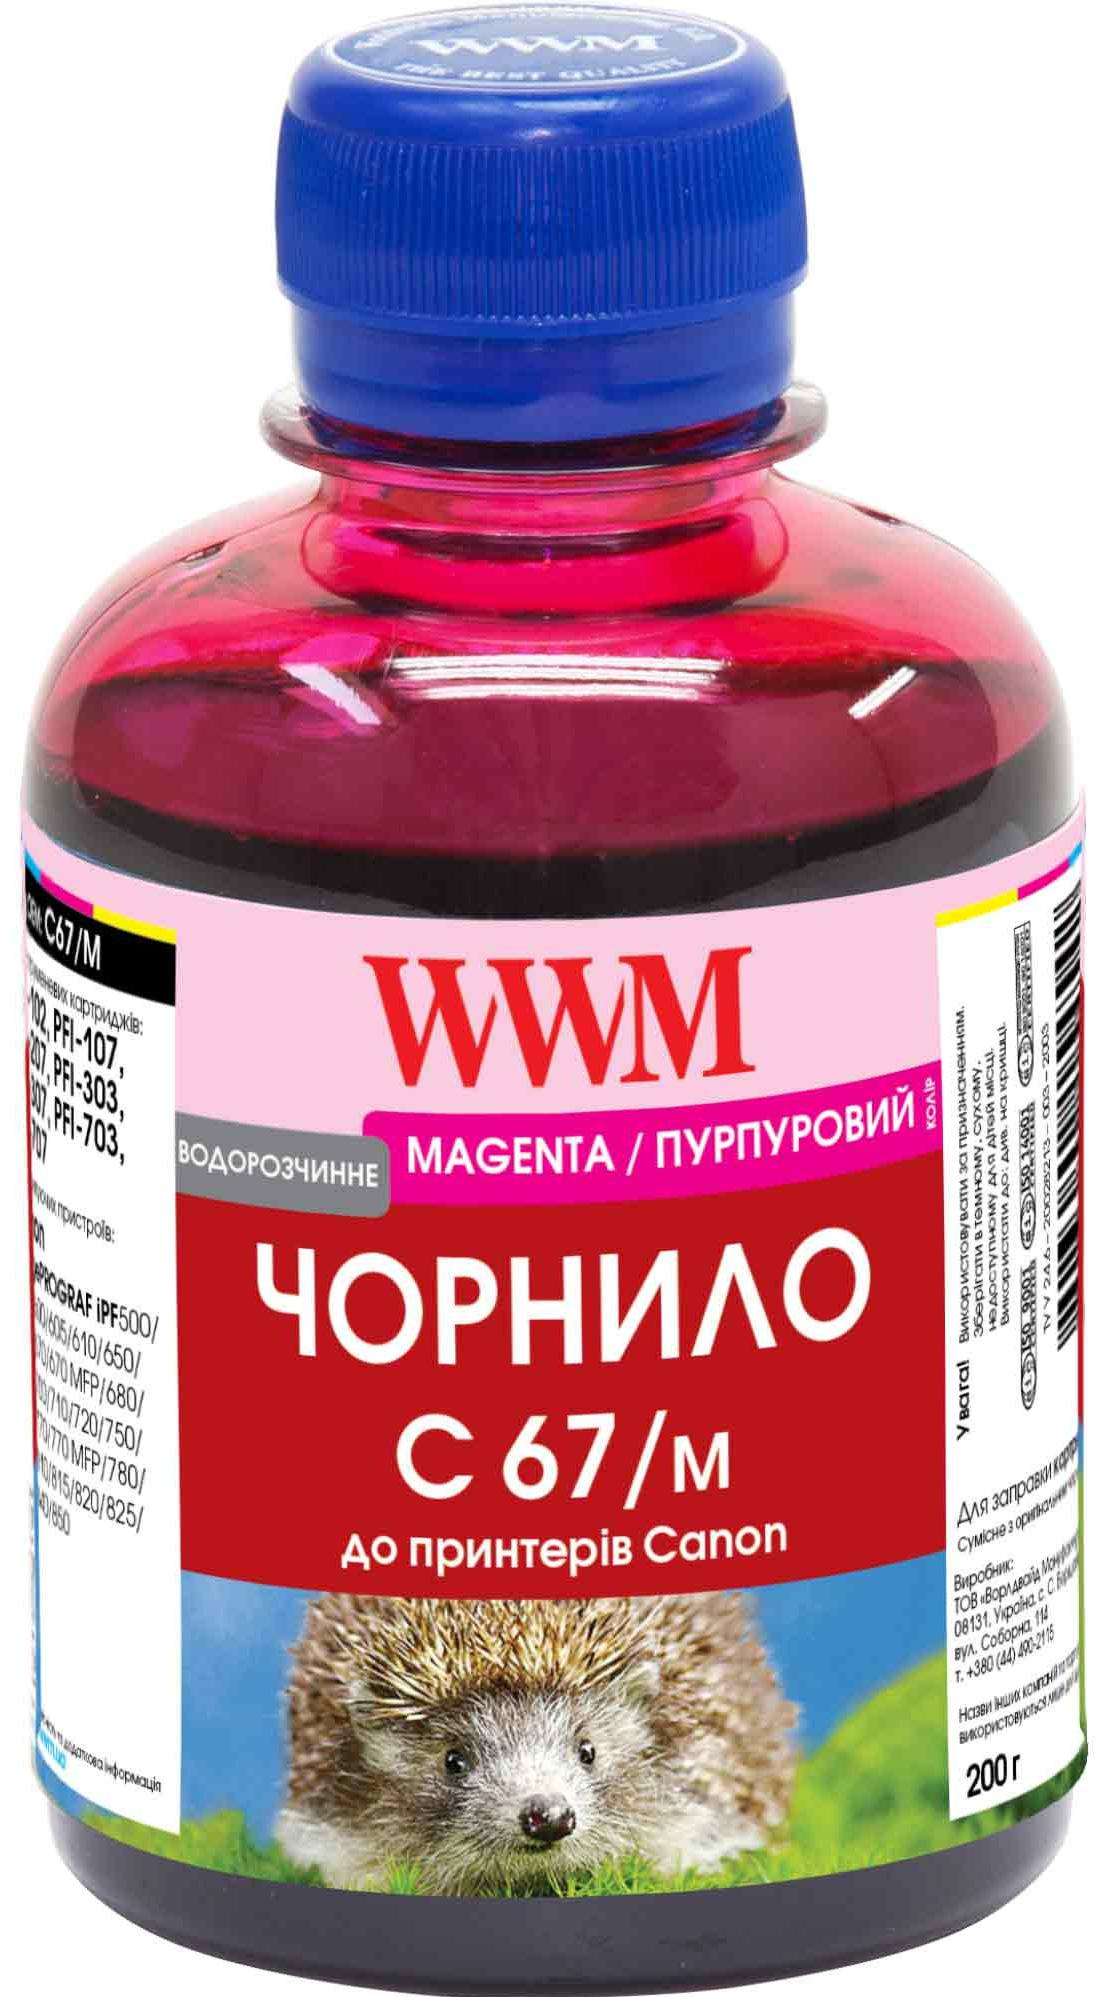 Купить Чорнило WWM for Canon IPF-107M - Magenta 200g (C67/M)